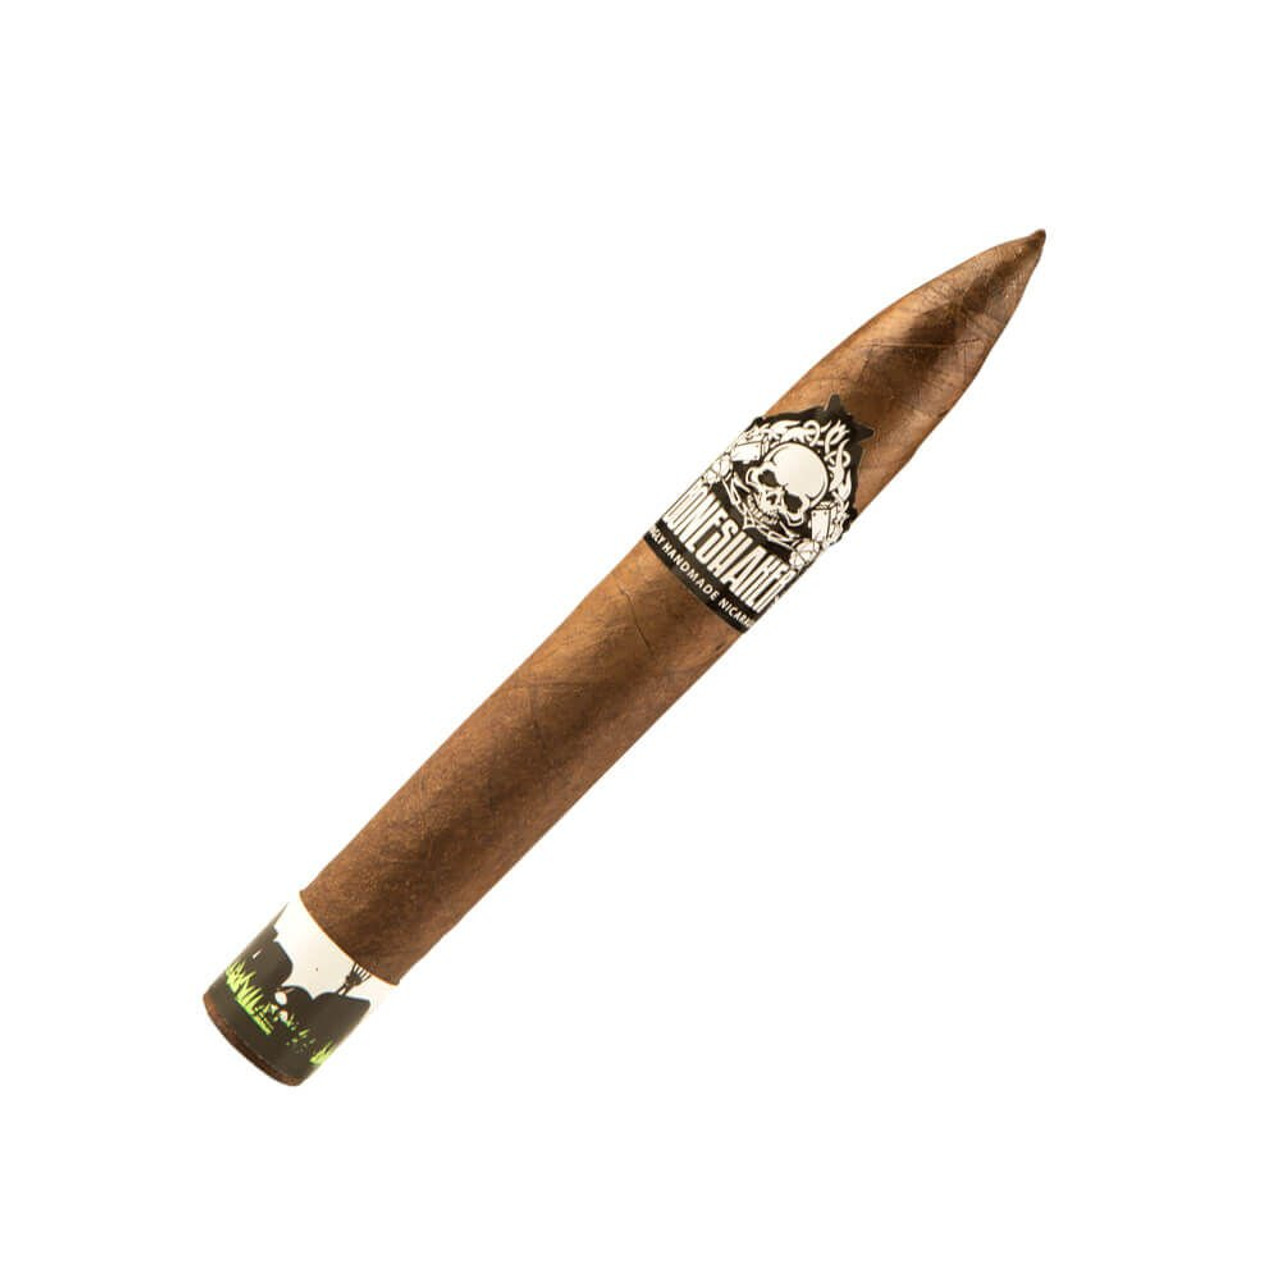 Boneshaker Boneyard Morning Star Cigars - 6.5 x 52 (Pack of 5)